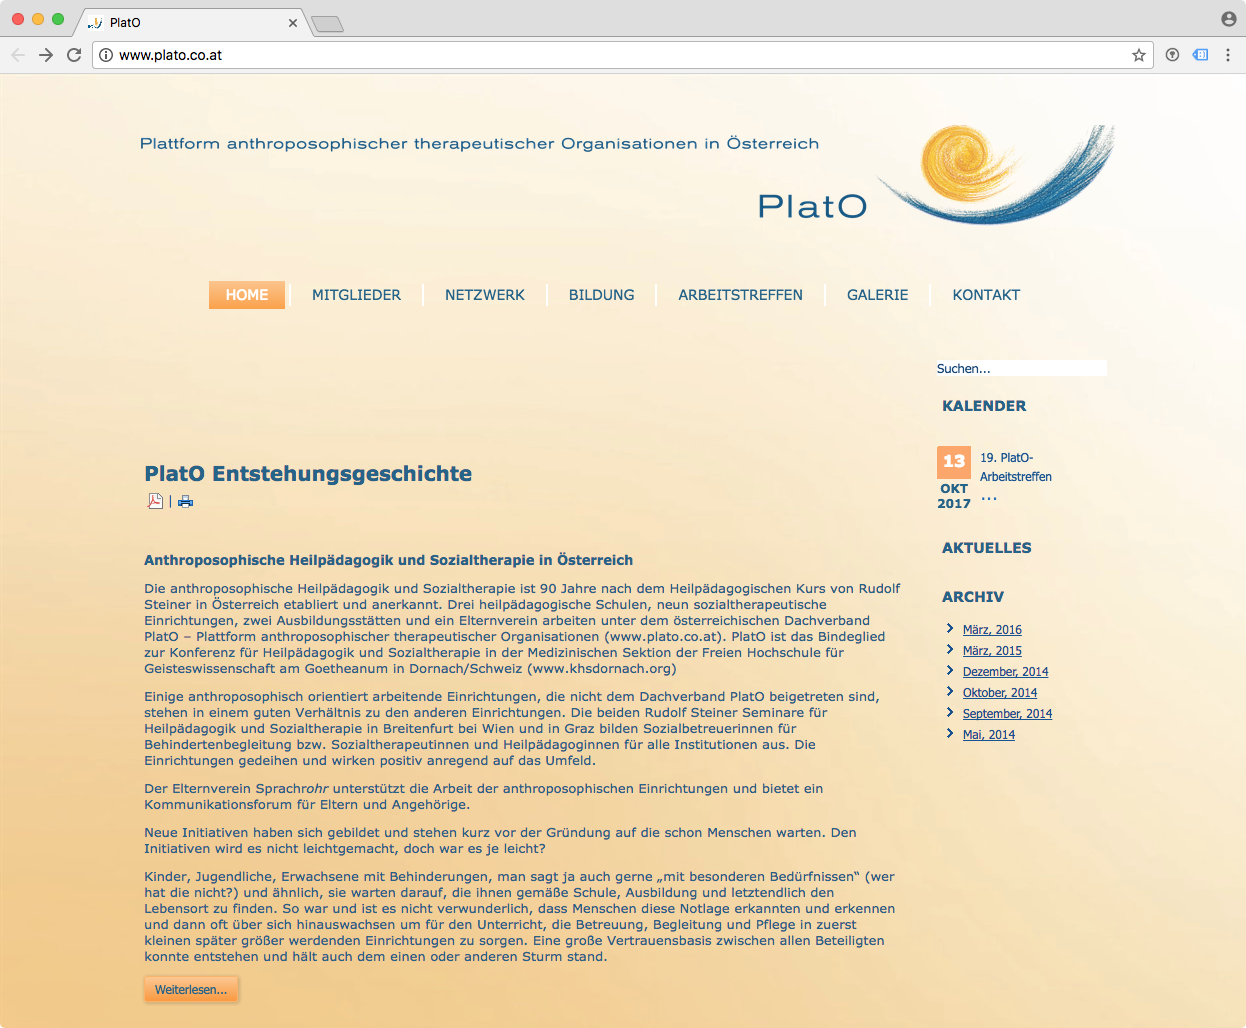 www.plato.co.at